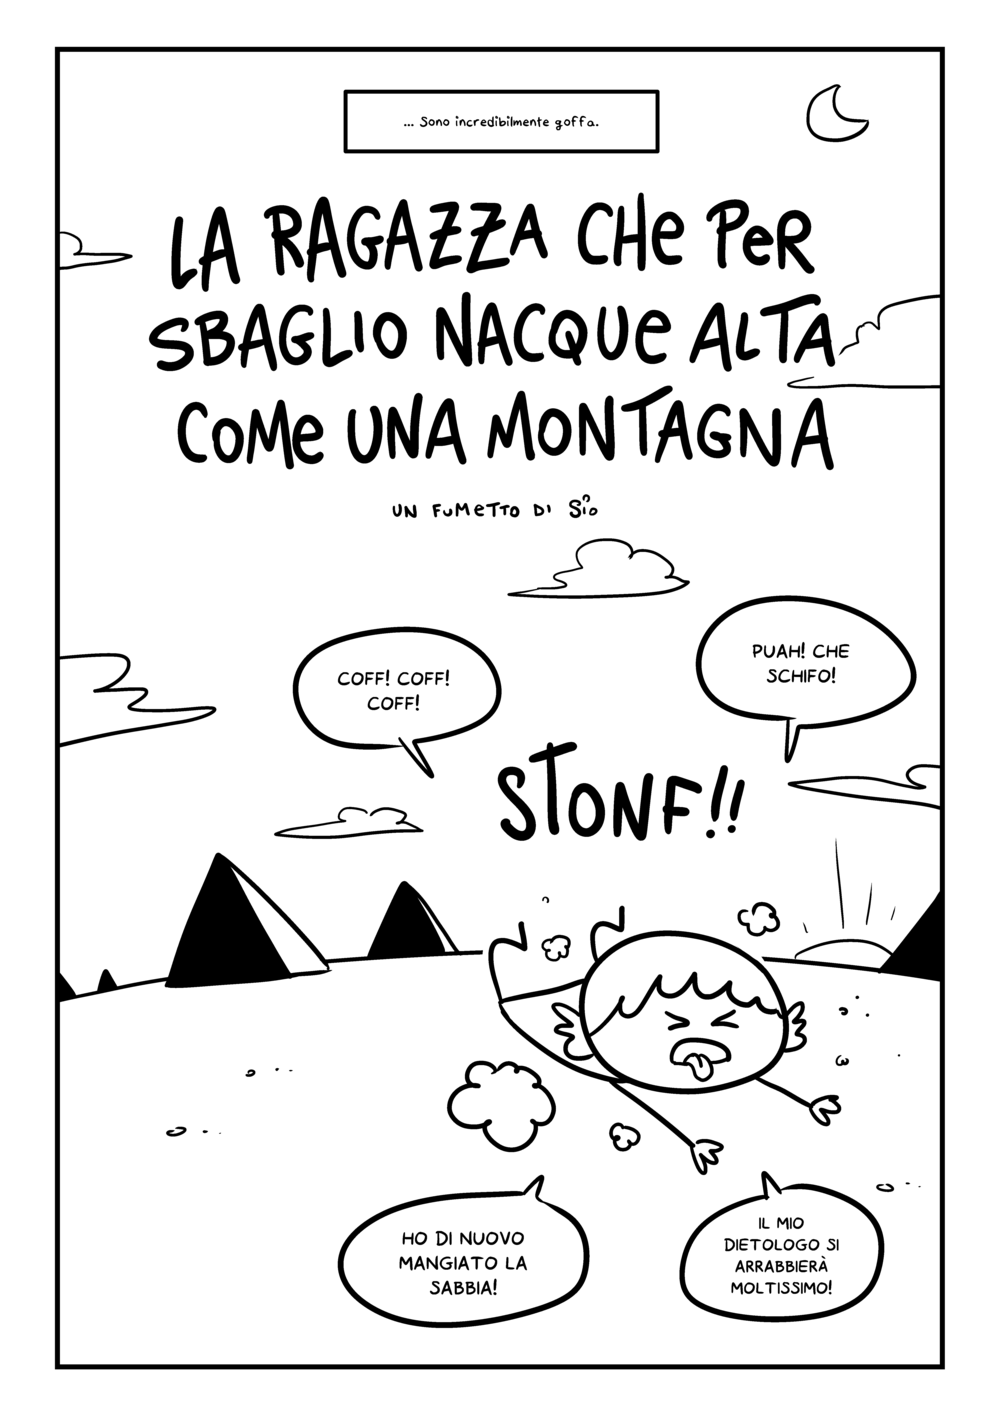 RagazzaMontagna_003.png